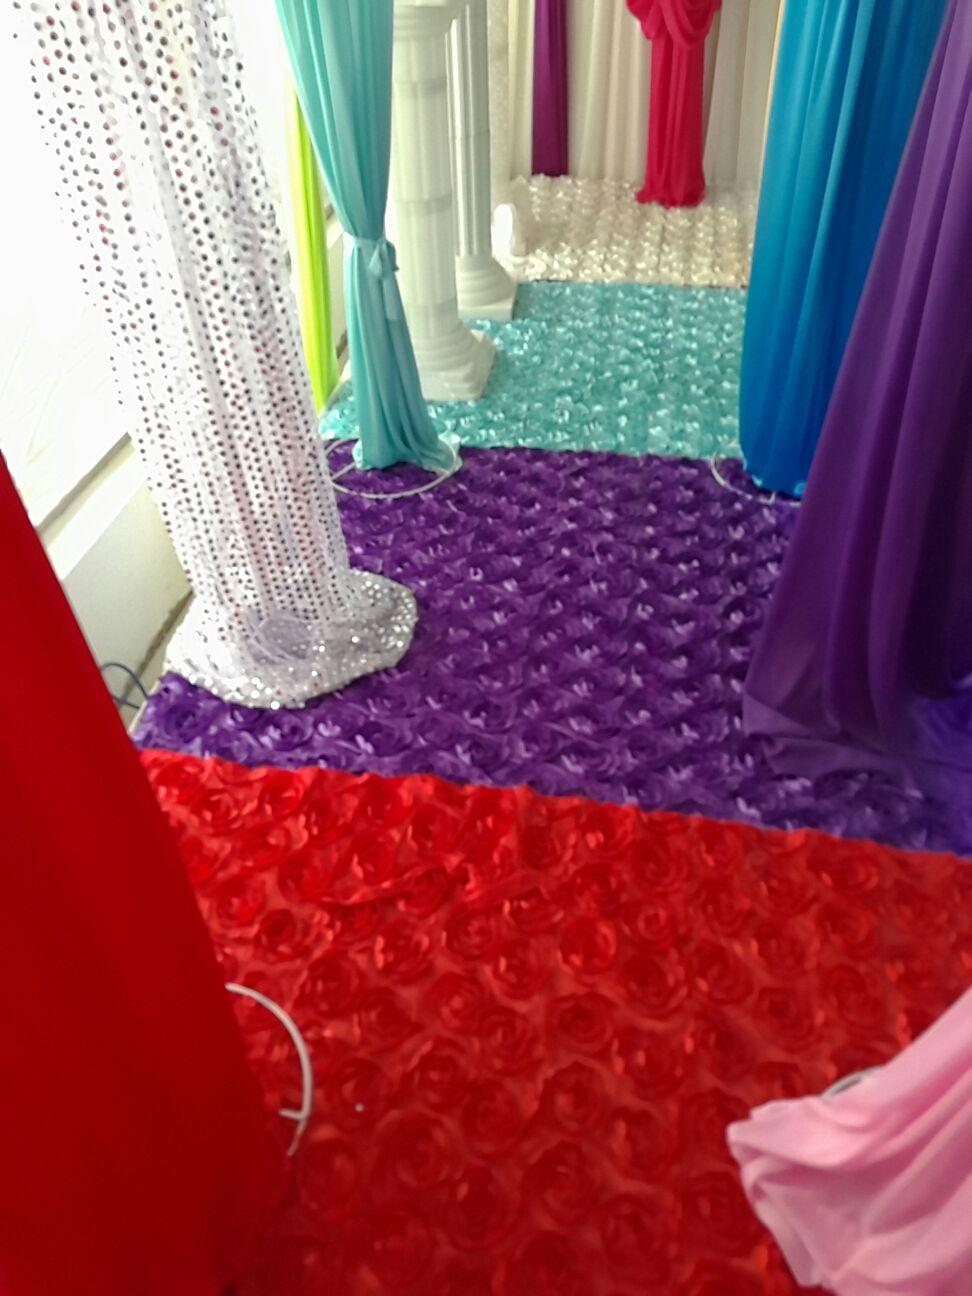 tapete de casamento, casamento 3D tapete do corredor